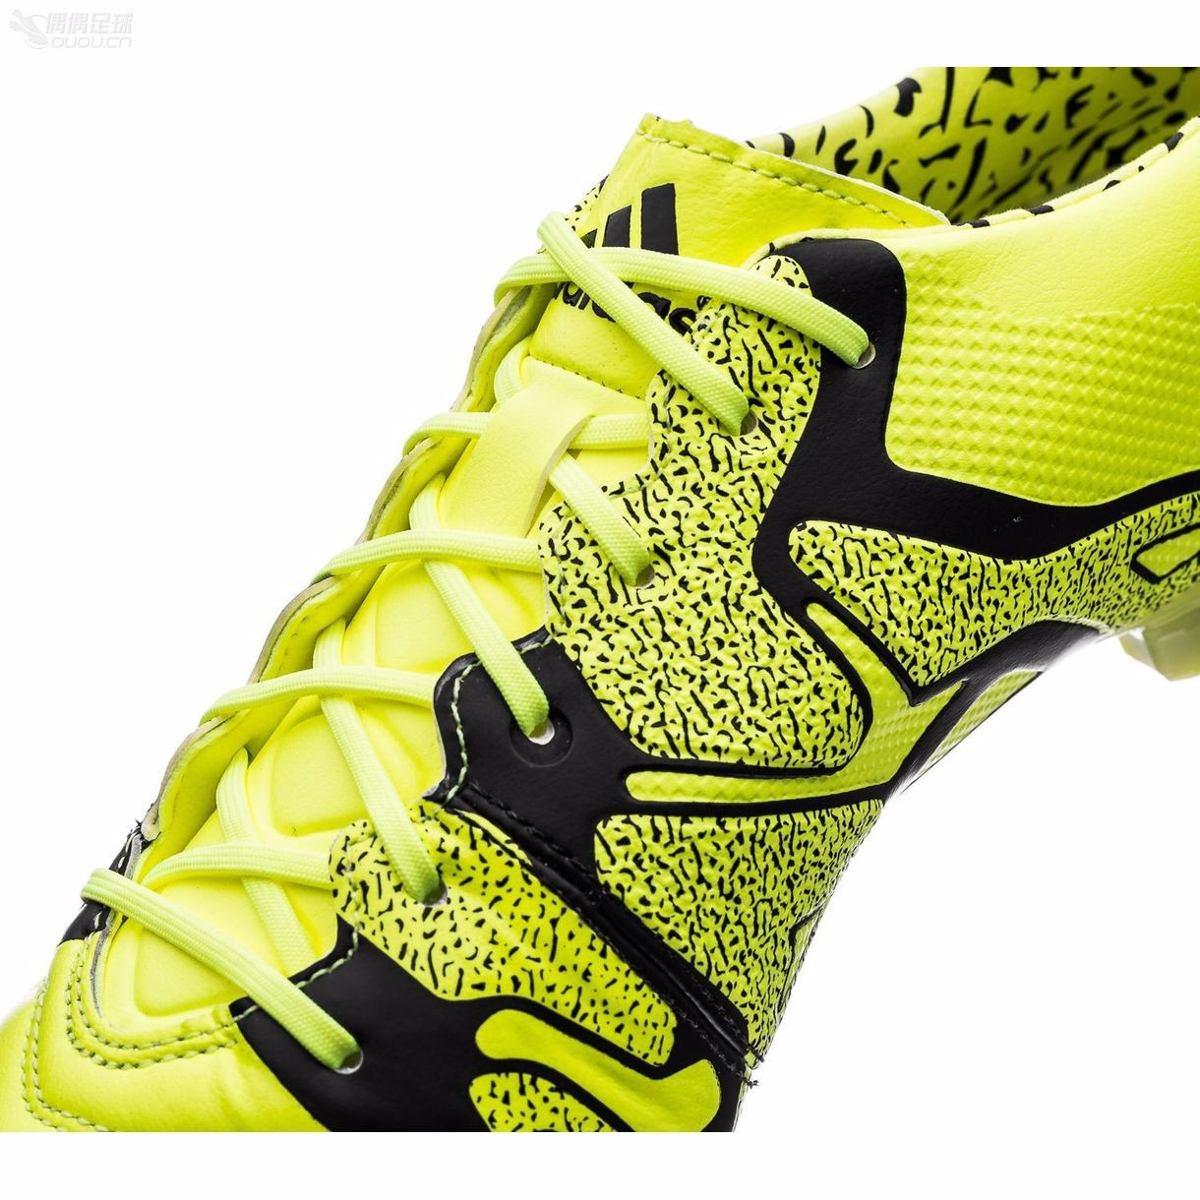 8572097a4b Chuteira Campo adidas X 15.1 Sg Couro Leather Pro 1magnus - R  529 ...